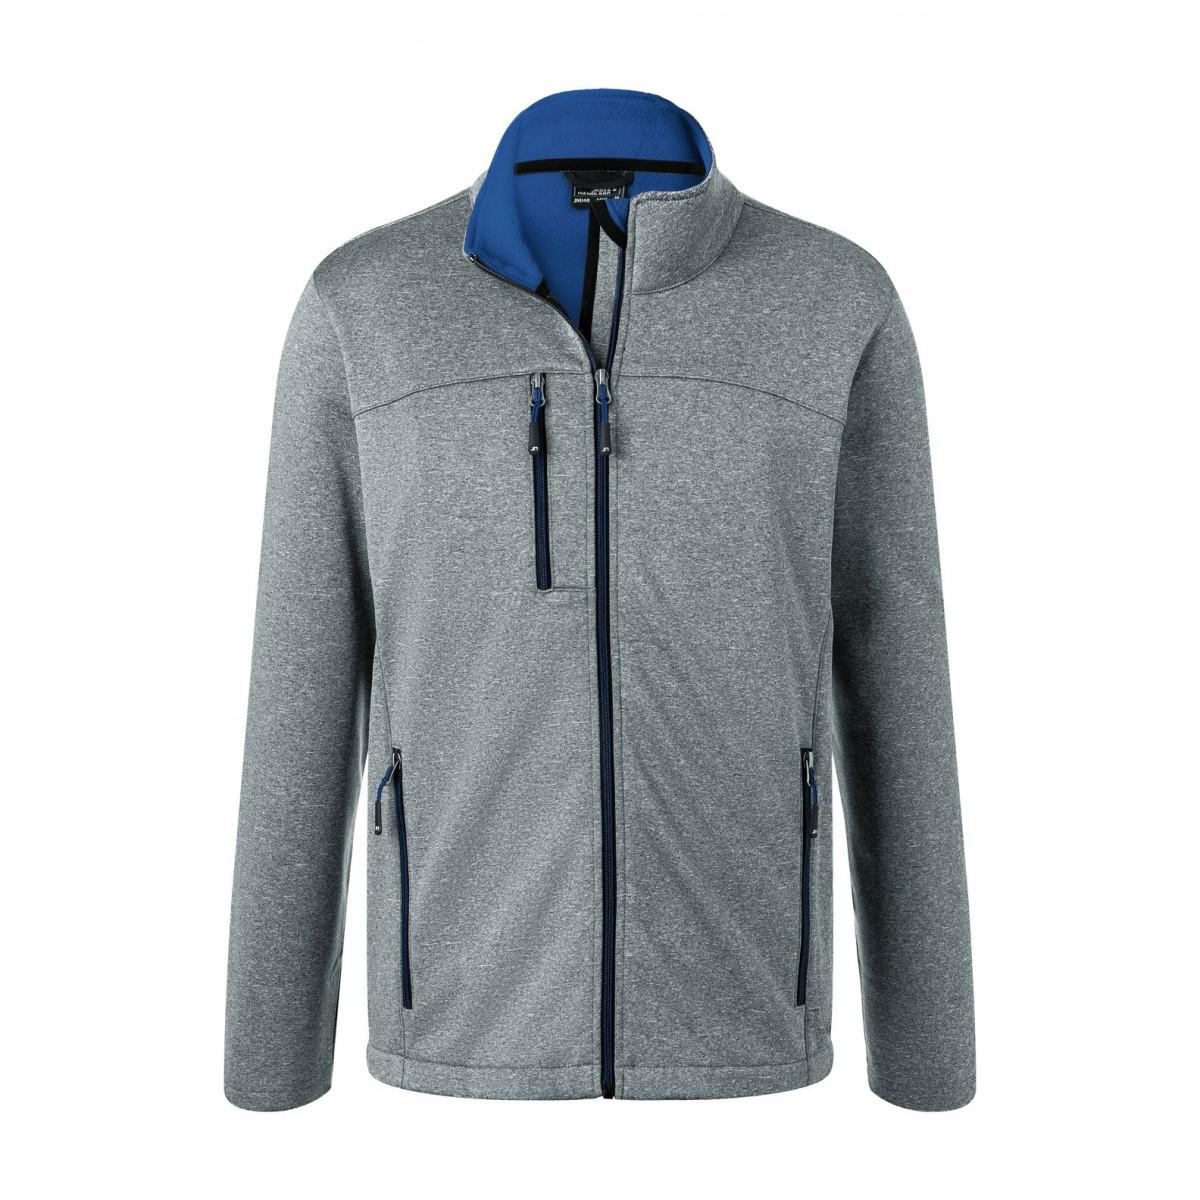 Куртка мужская JN1148 Mens Softshell Jacket - Темно-серый меланж/Ярко-синий